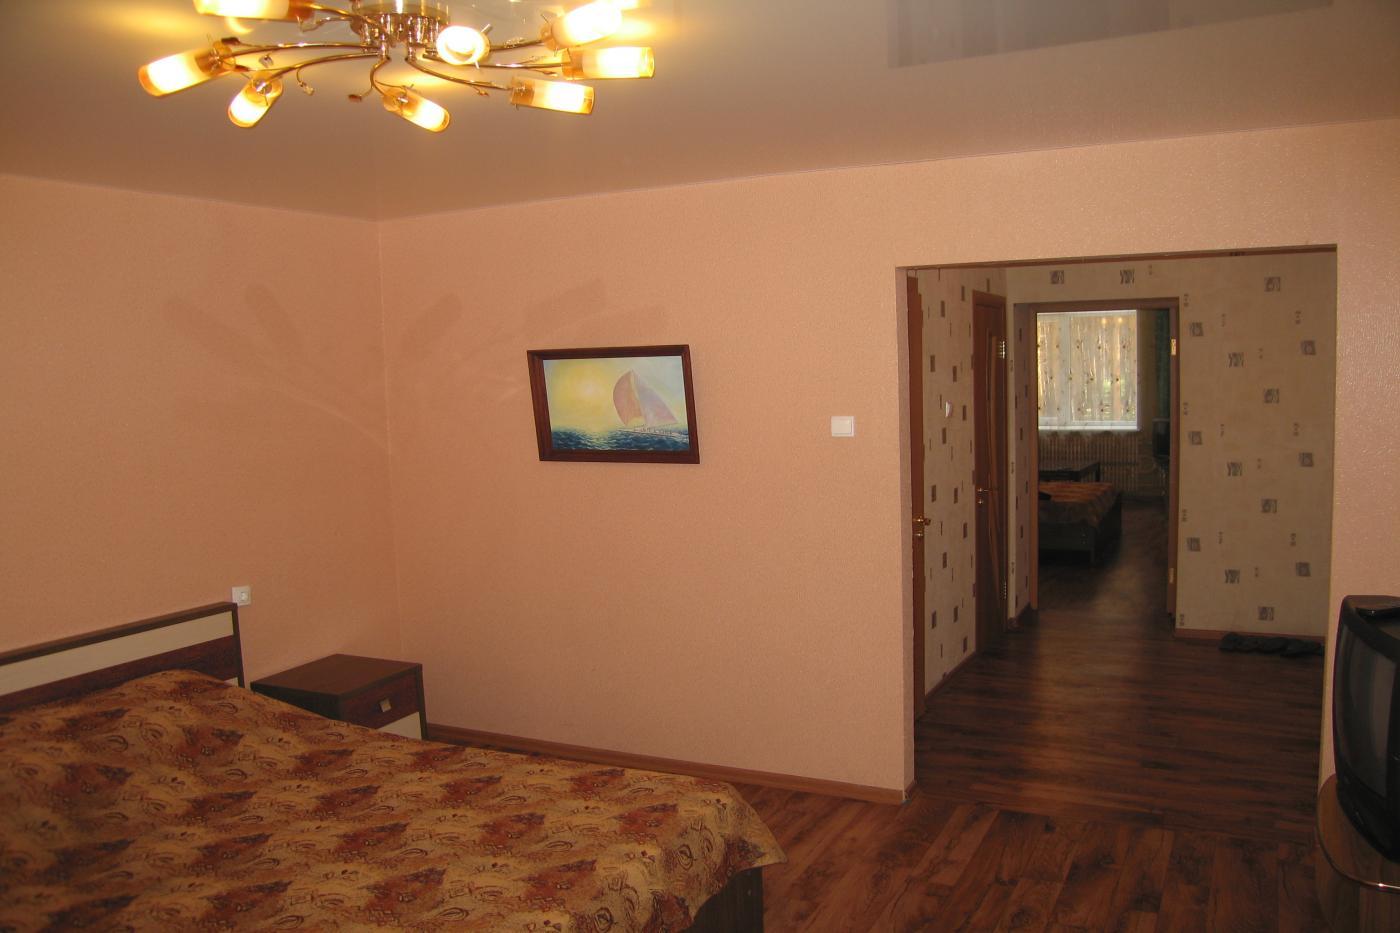 2-комнатная квартира посуточно (вариант № 2606), ул. Антонова-Овсеенко улица, фото № 2